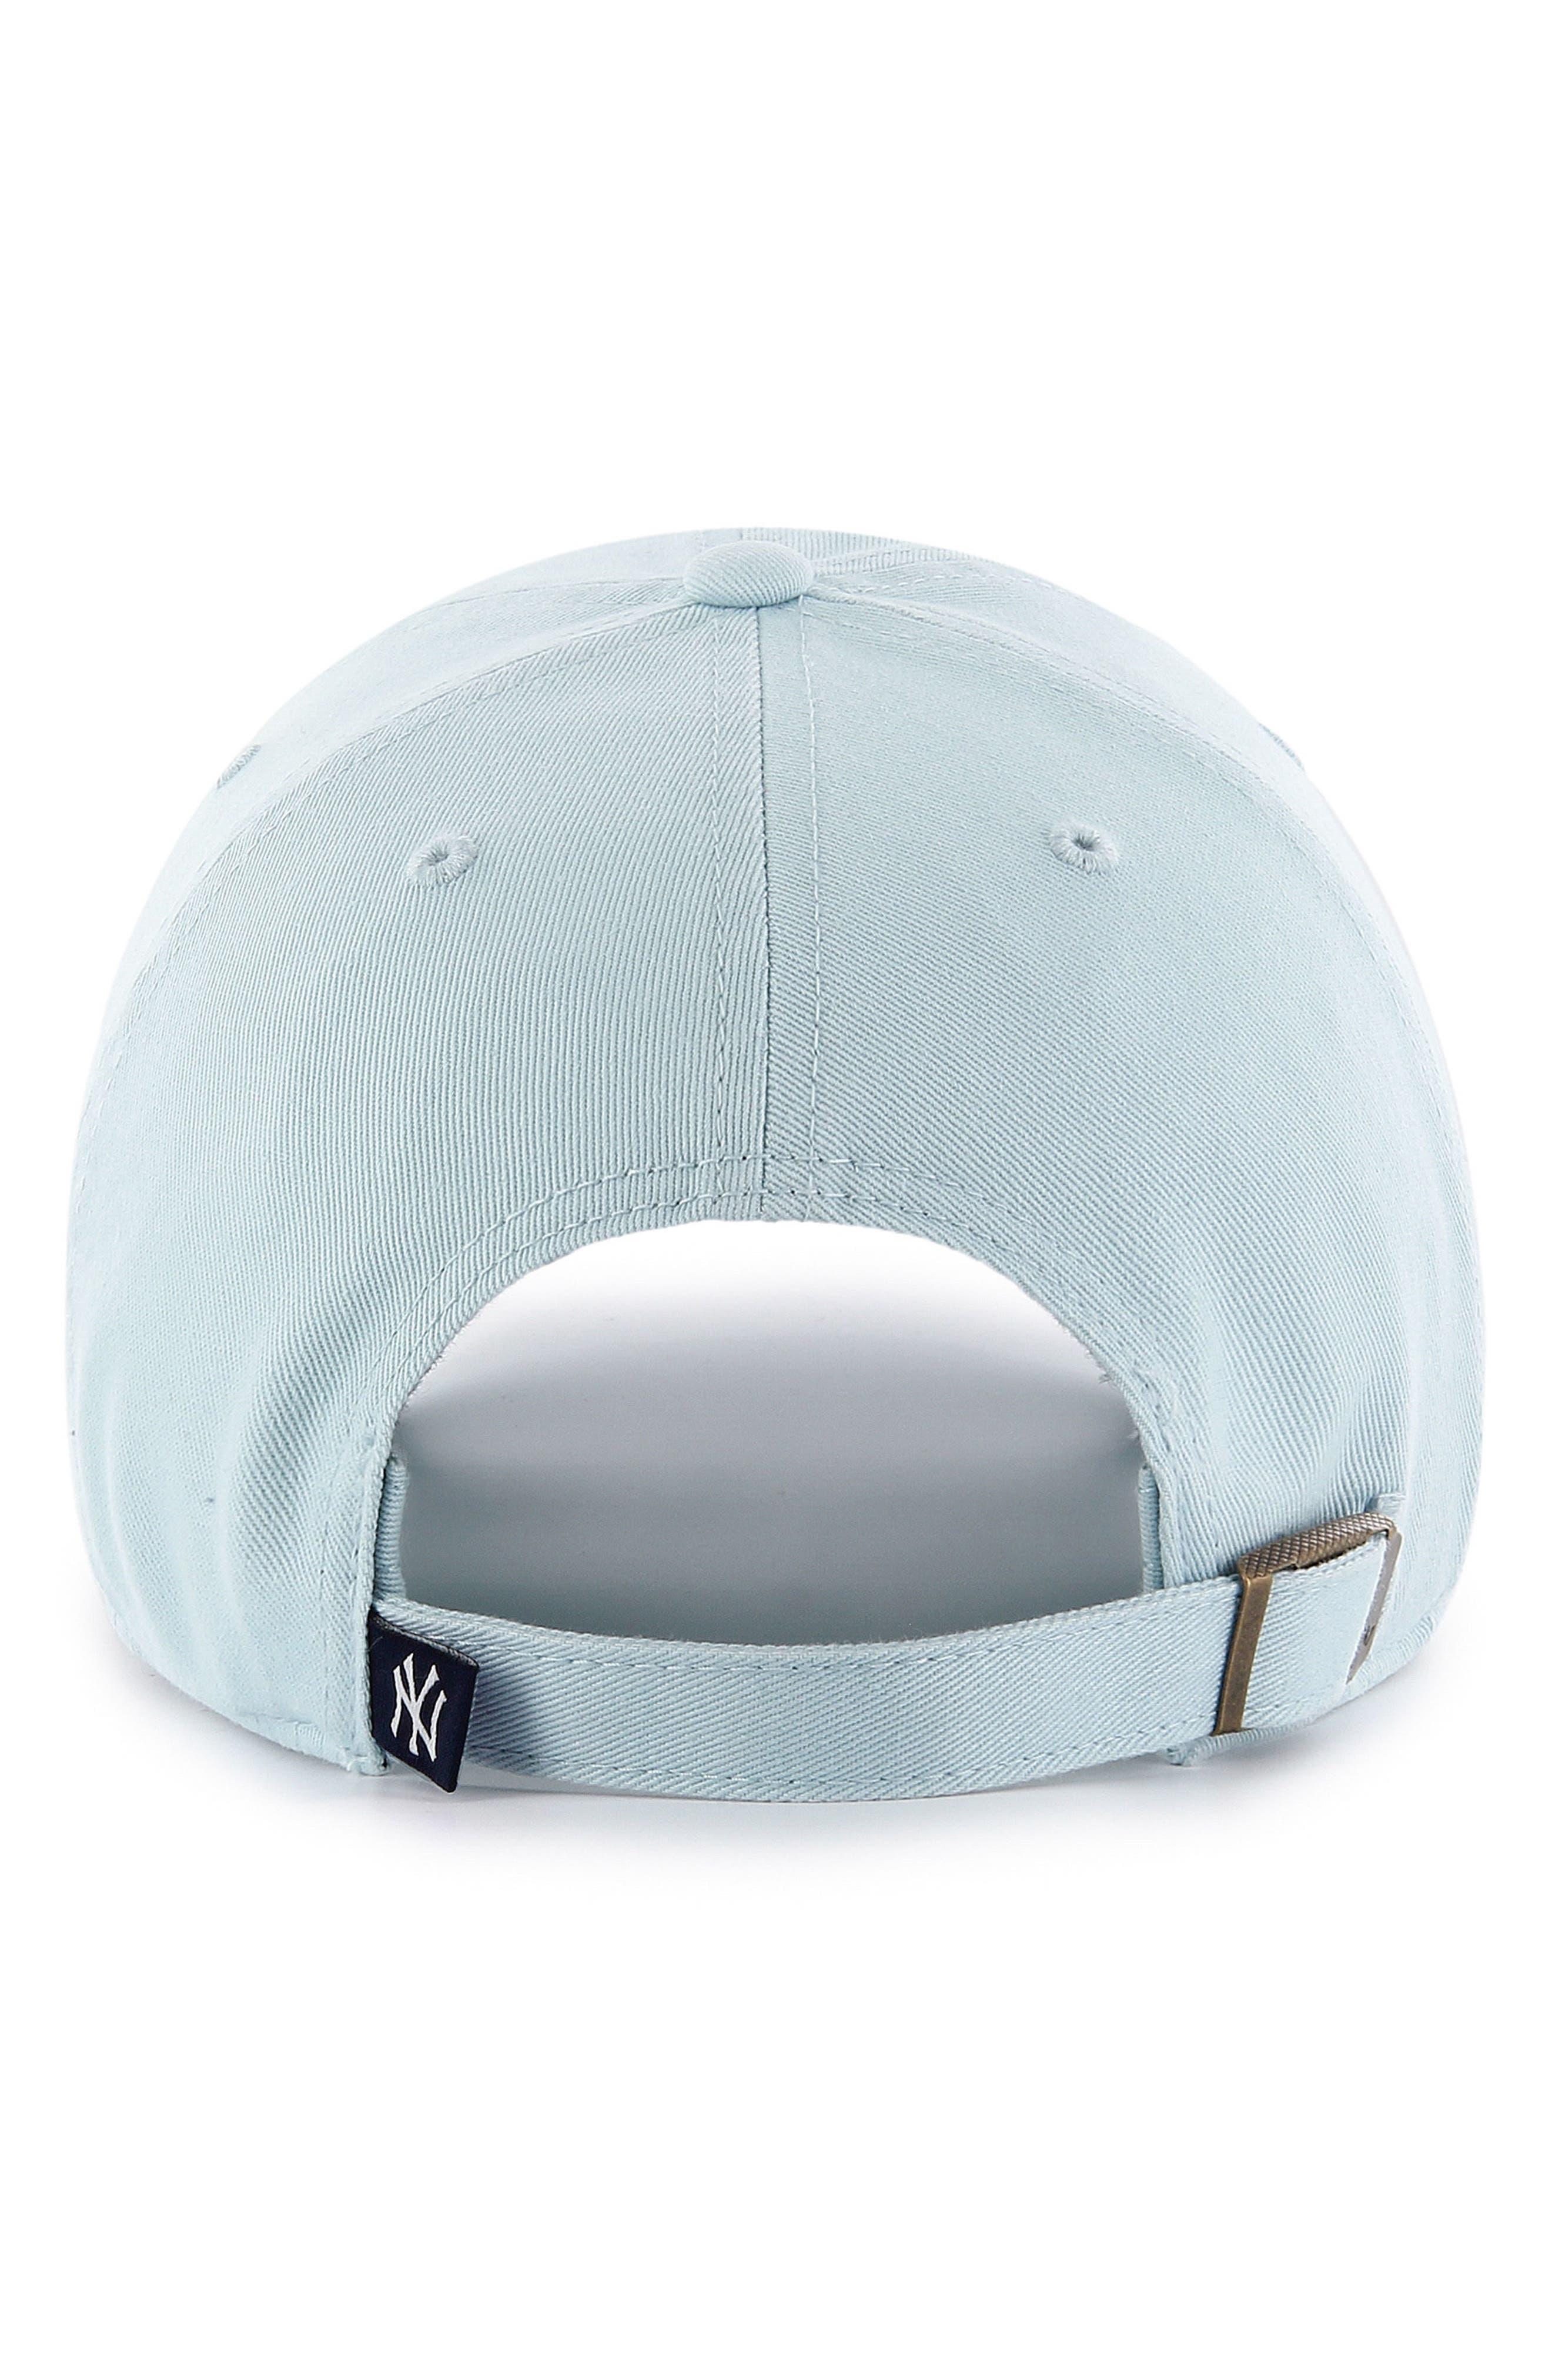 Alternate Image 2  - '47 NY Yankees Baseball Cap